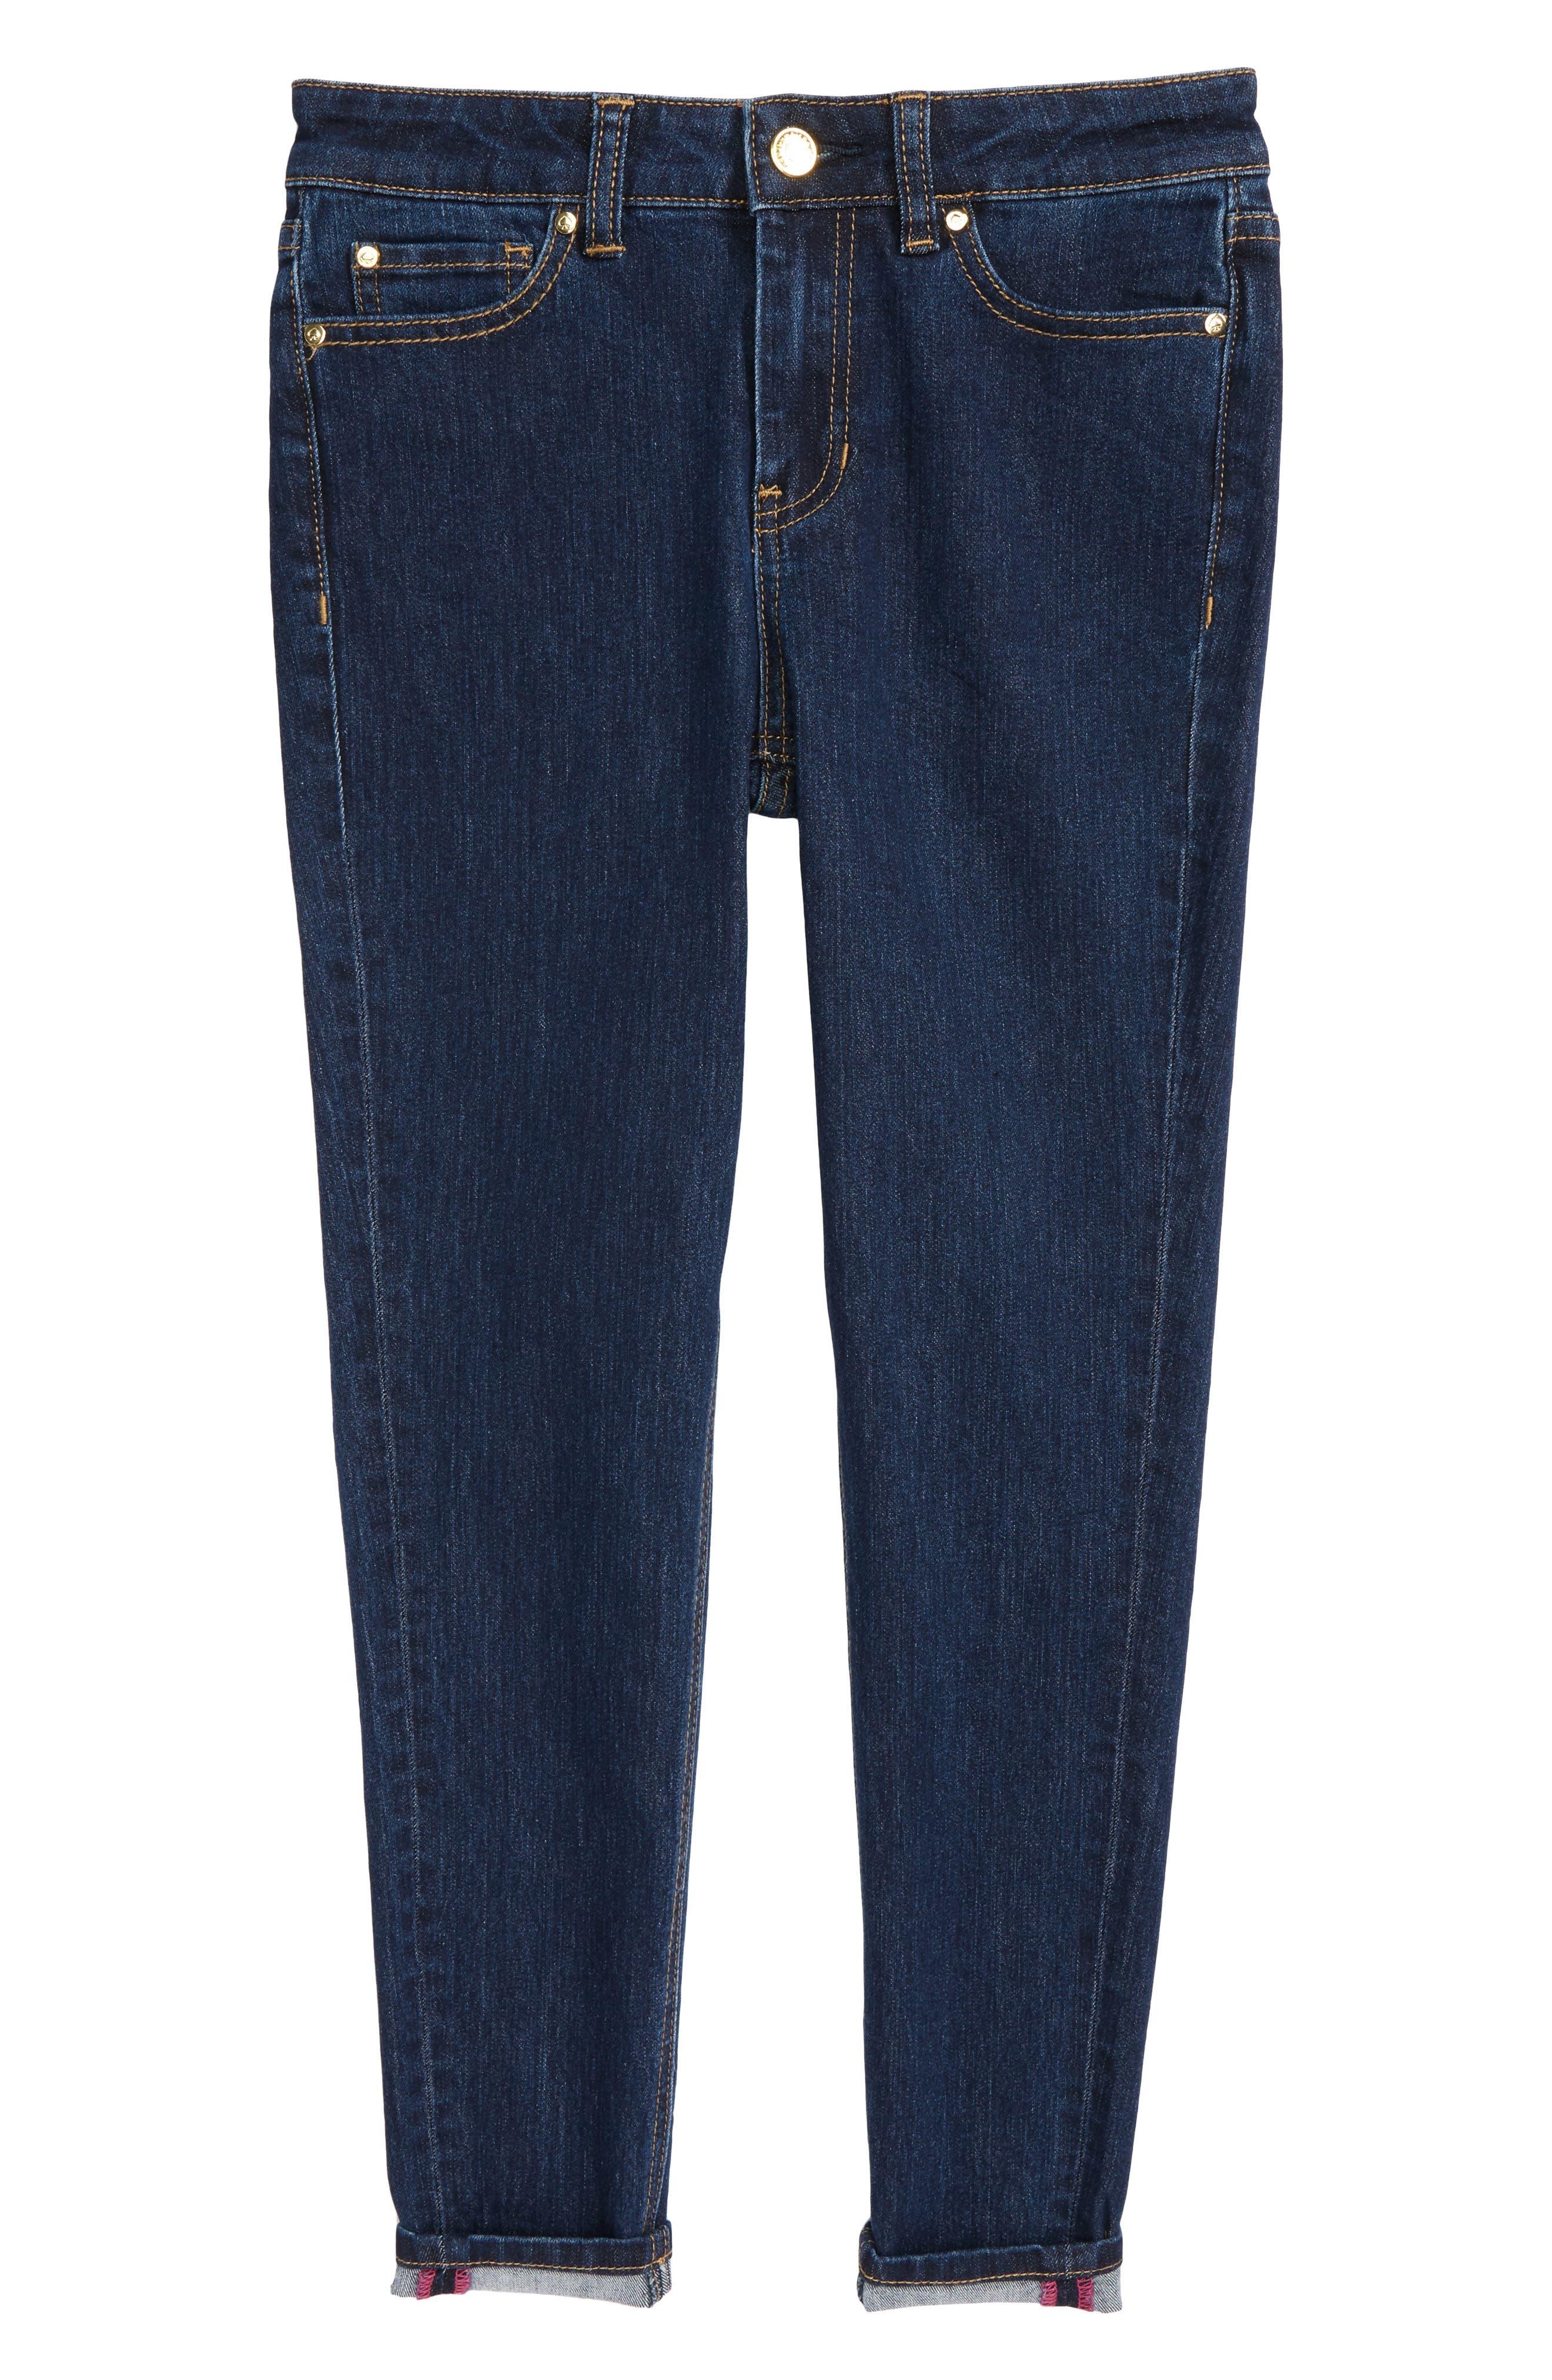 skinny jeans,                             Main thumbnail 1, color,                             402